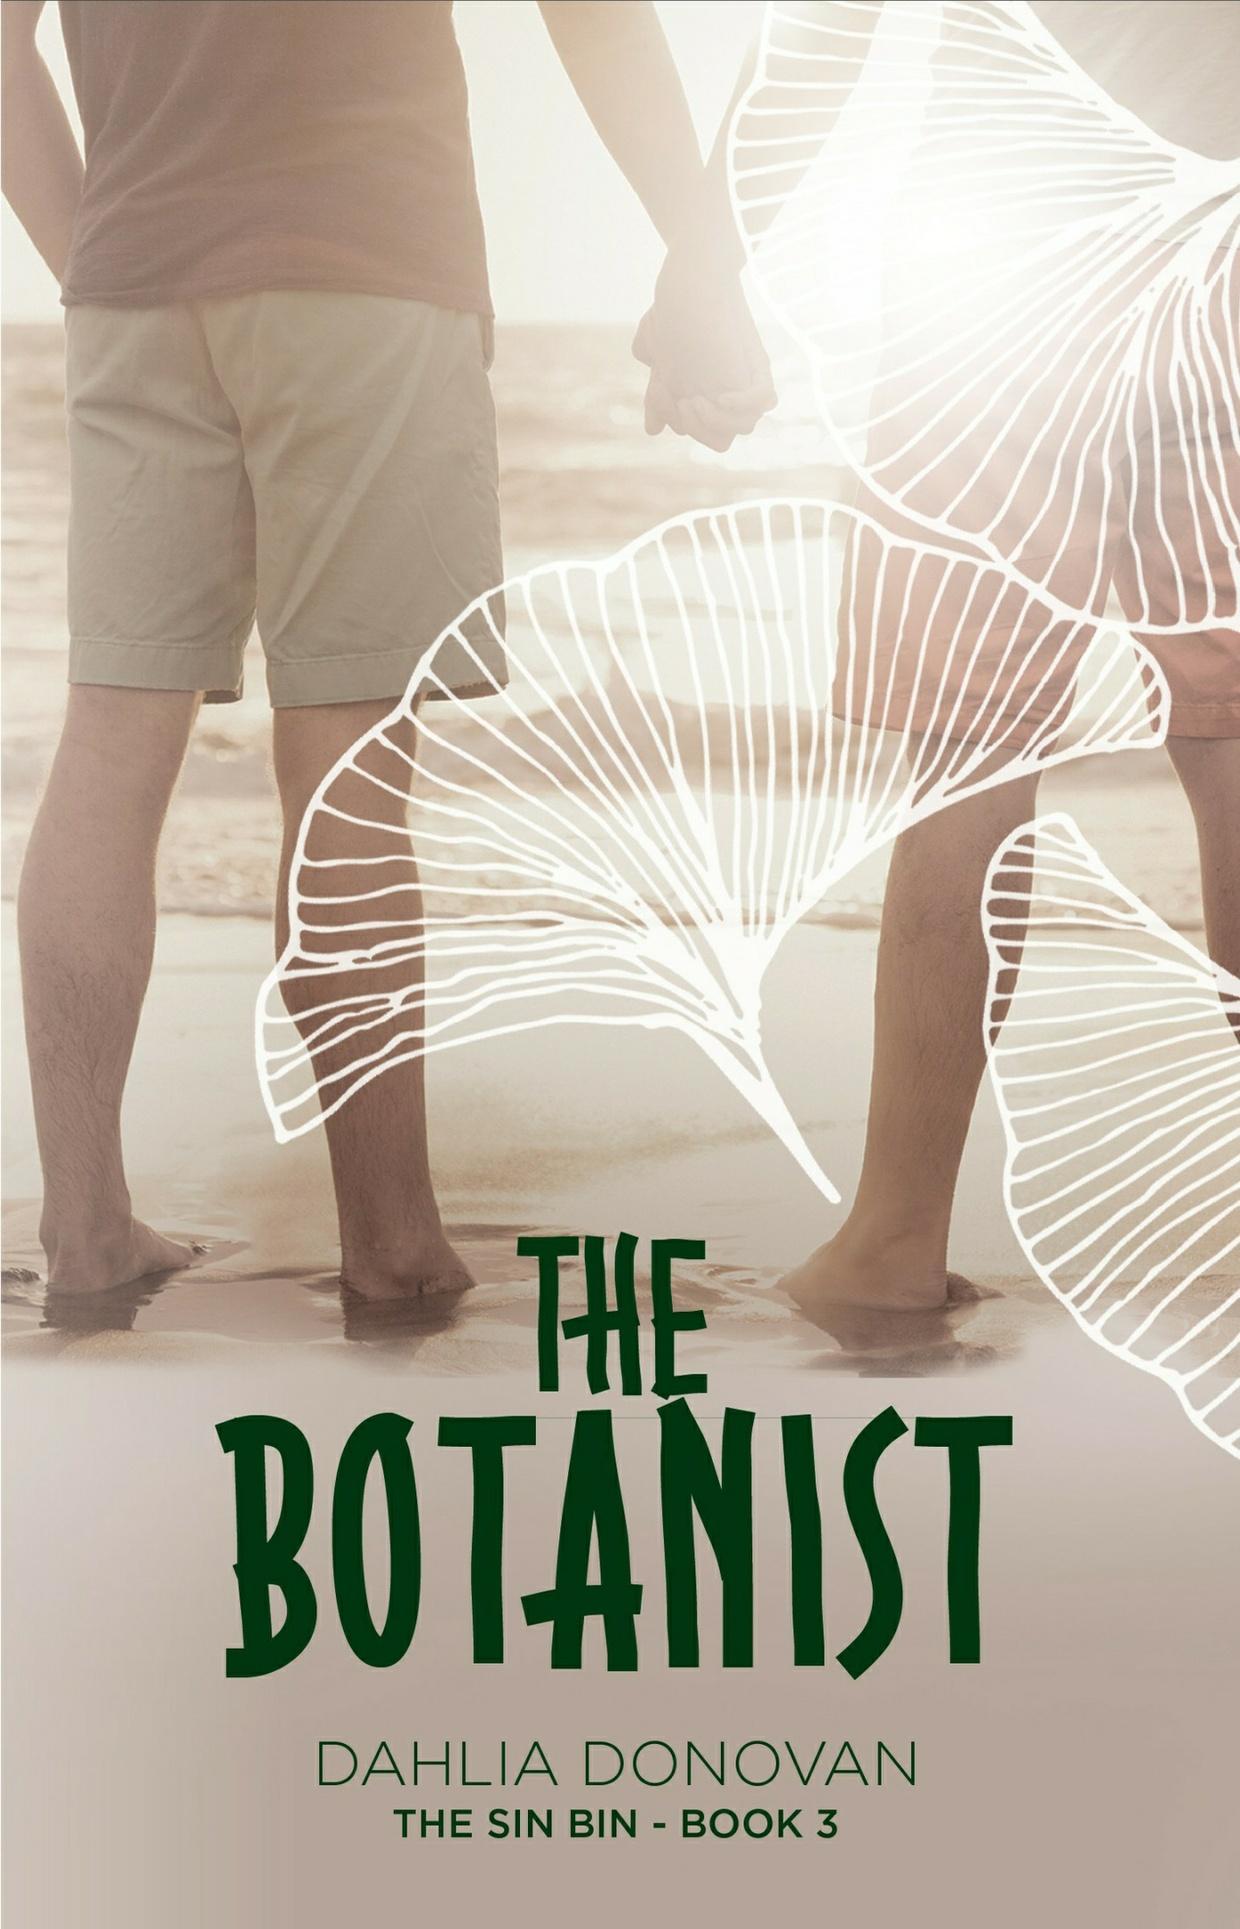 Mobi The Botanist by Dahlia Donovan